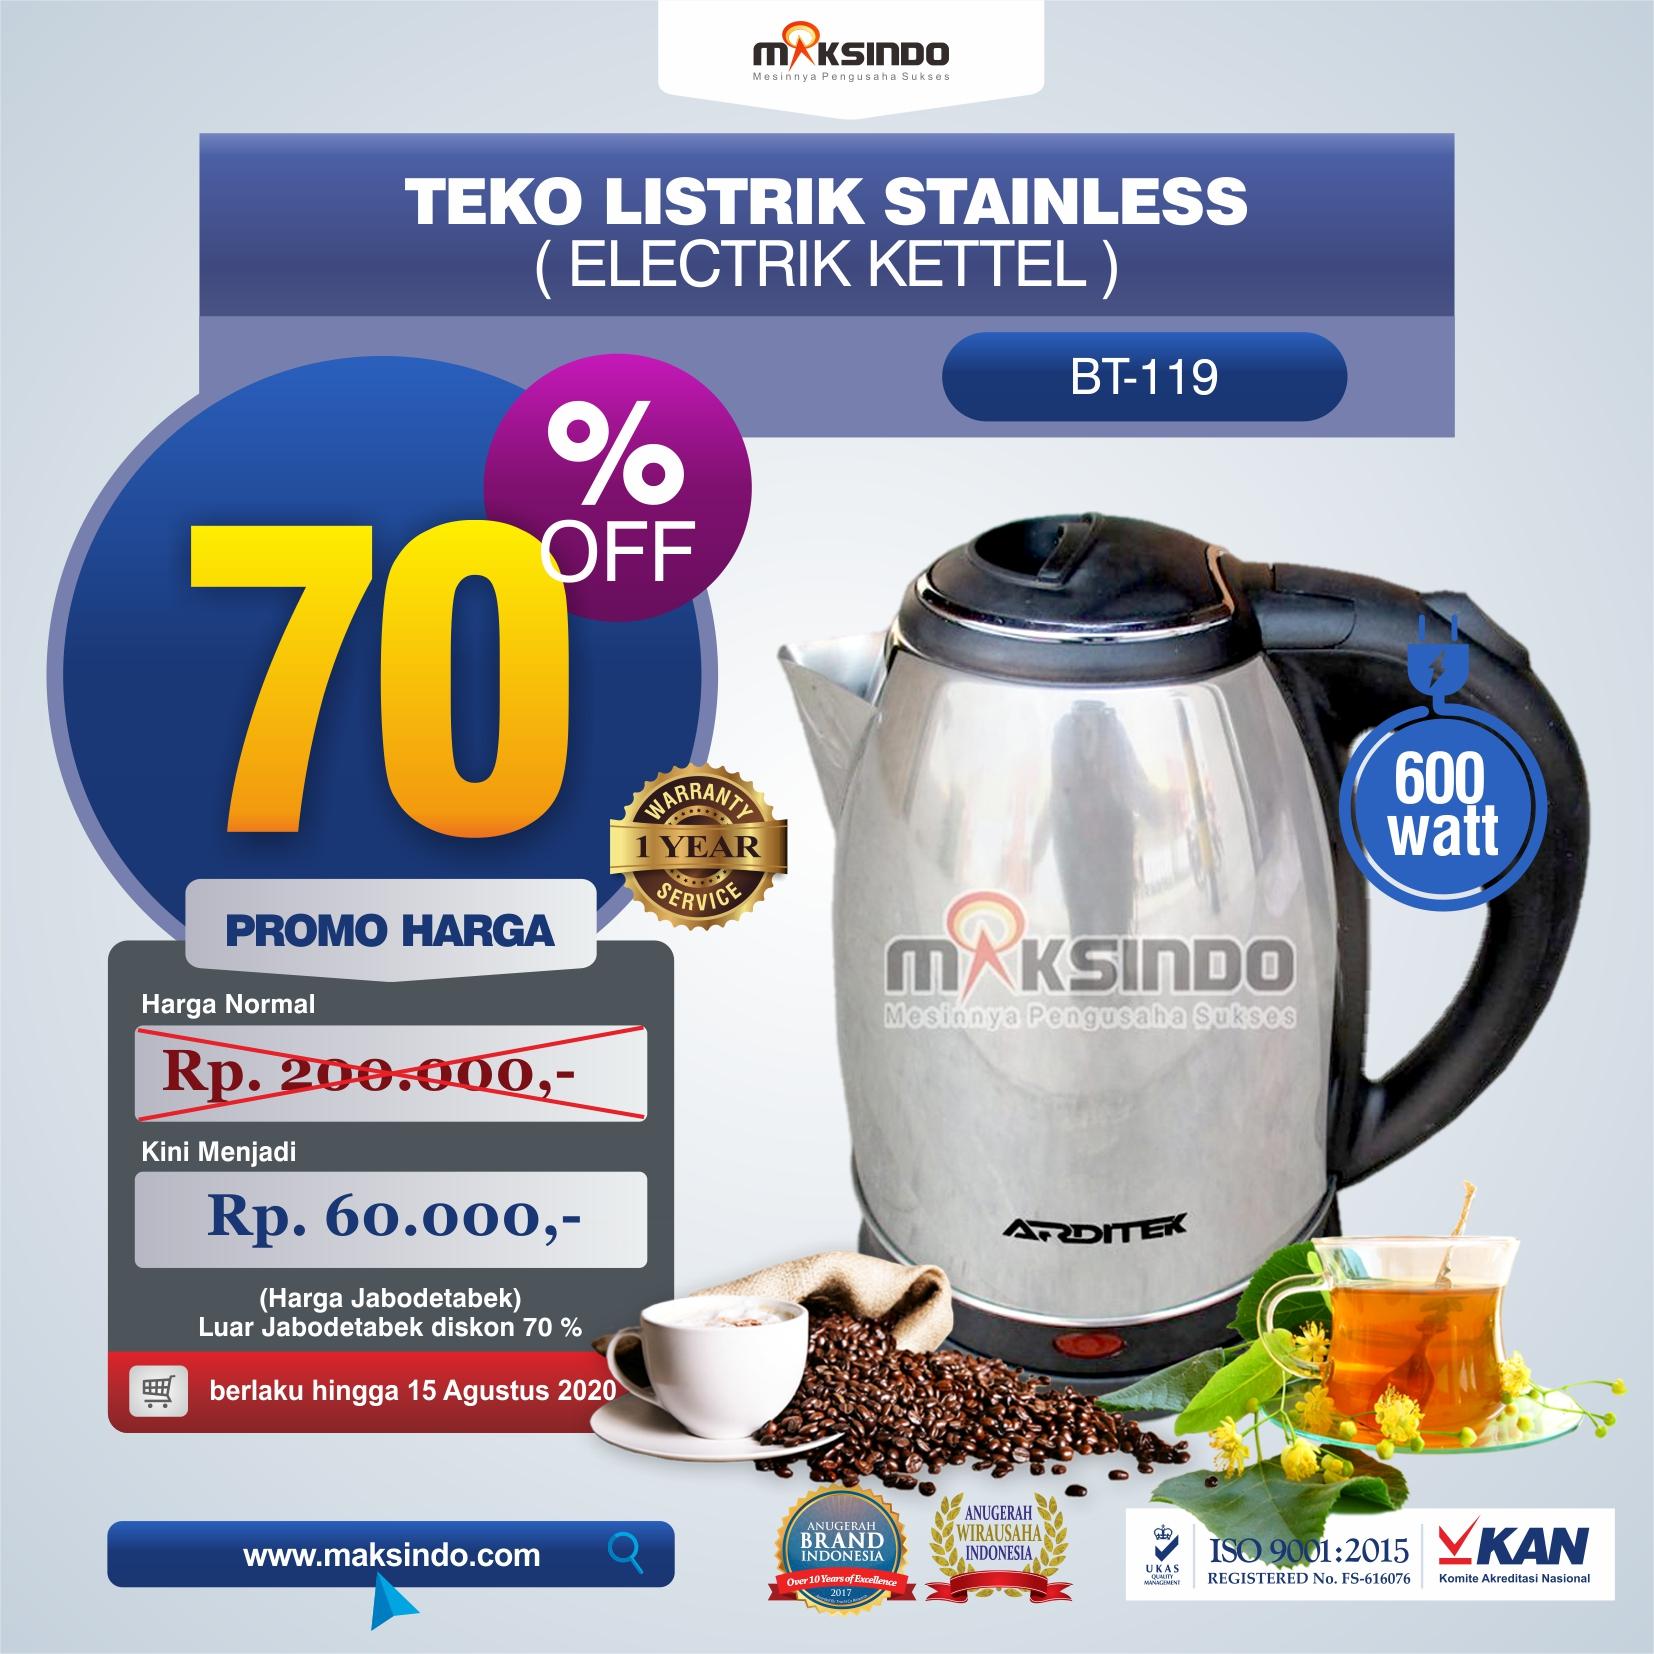 Teko Listrik Stainless (Electrik Kettel) BT-119